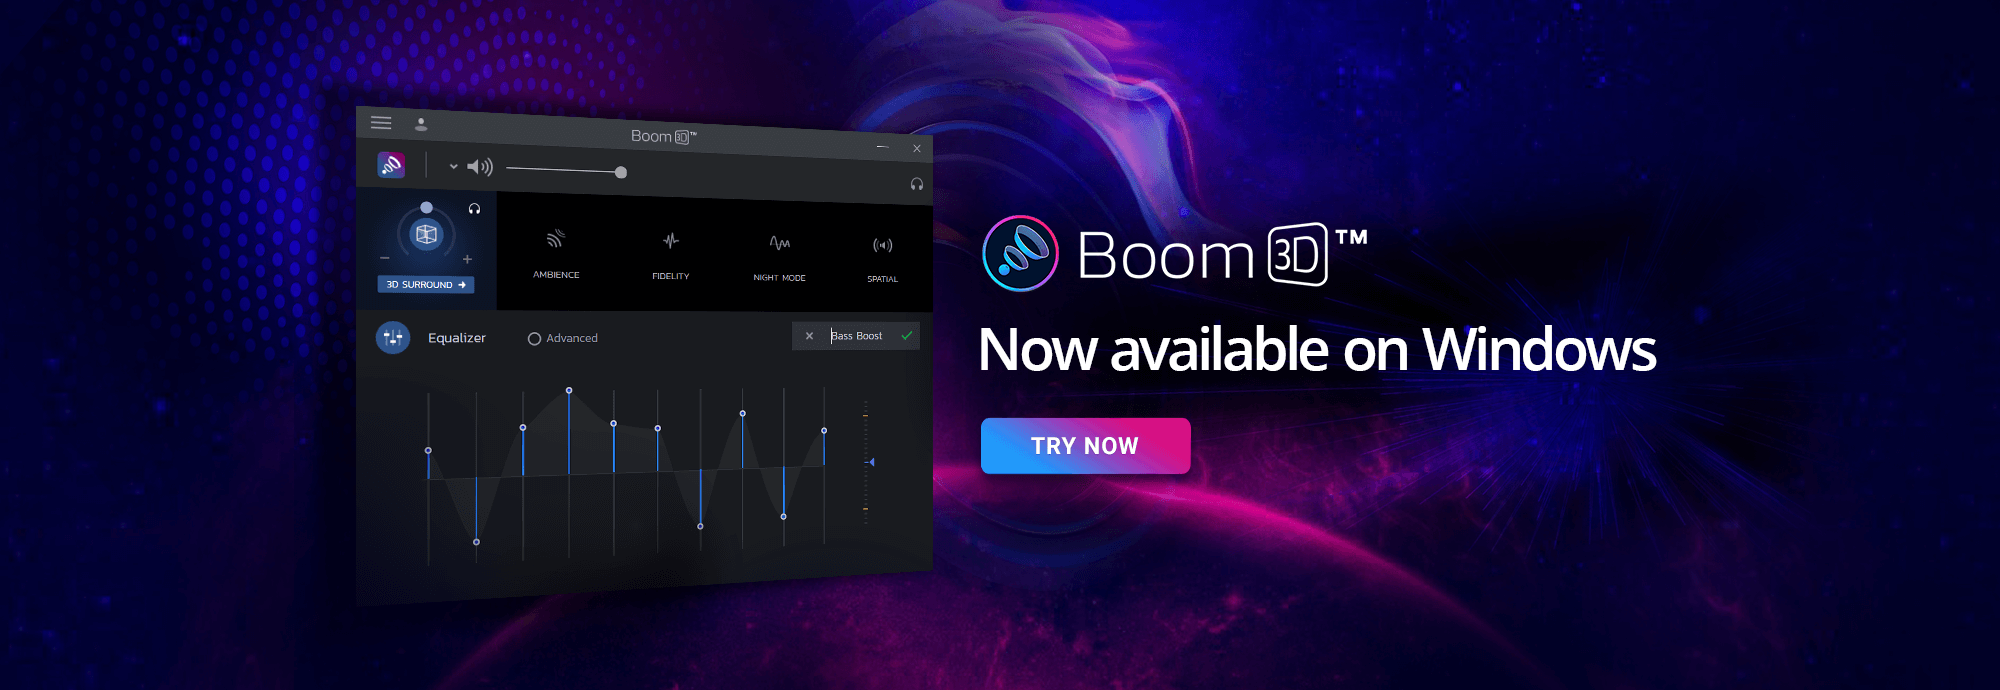 Boom3d Windows Launch Banner 2021